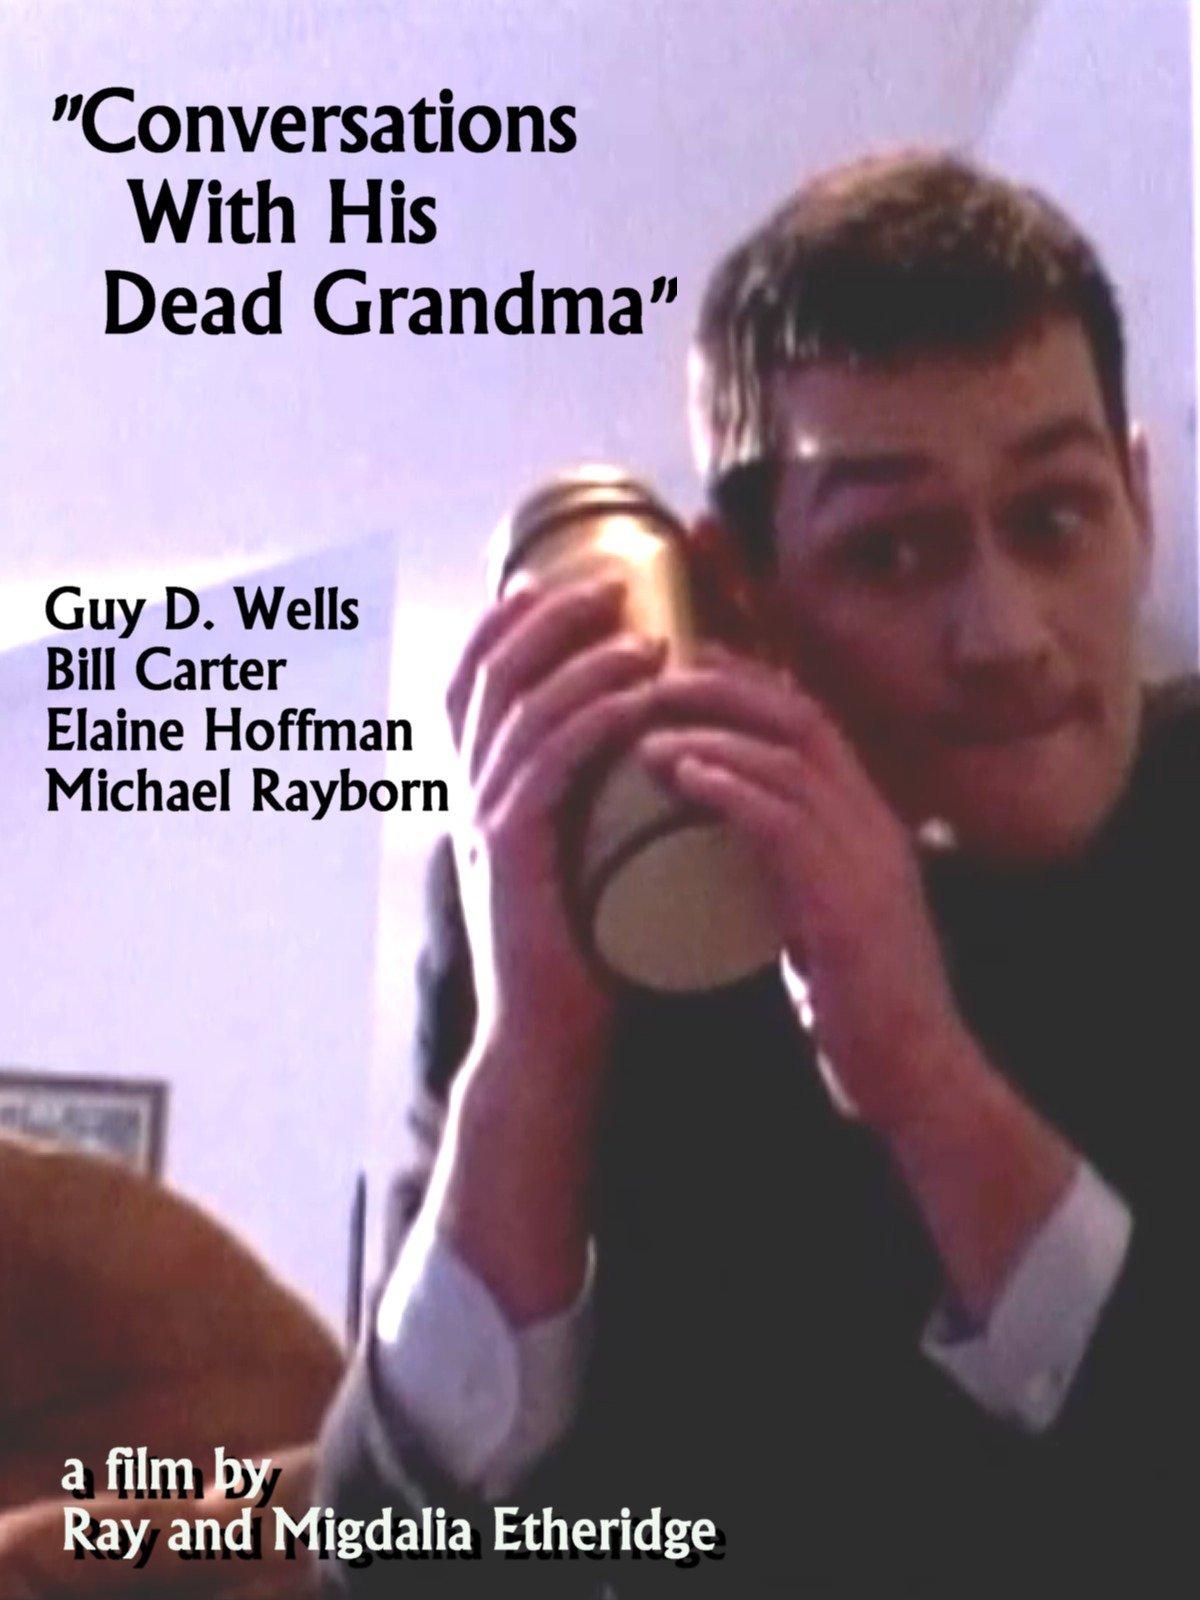 Conversations With His Dead Grandma